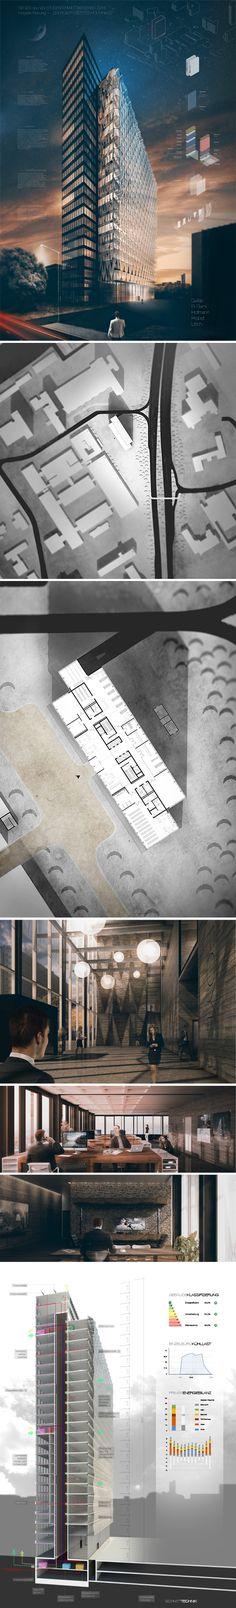 """ENERGIEEFFIZIENTES HOCHHAUS"" VDI WETTBEWERB 2015 — Platz 1 integrale Planung Studenten 7. Semesters Kevin Gallas Mayer (A) Ali Tarek Ali El-Elemi (A) Kai Hofmann (BI) Sebastian Probst (BI) Eva Ullrich (TGA) HS Coburg"